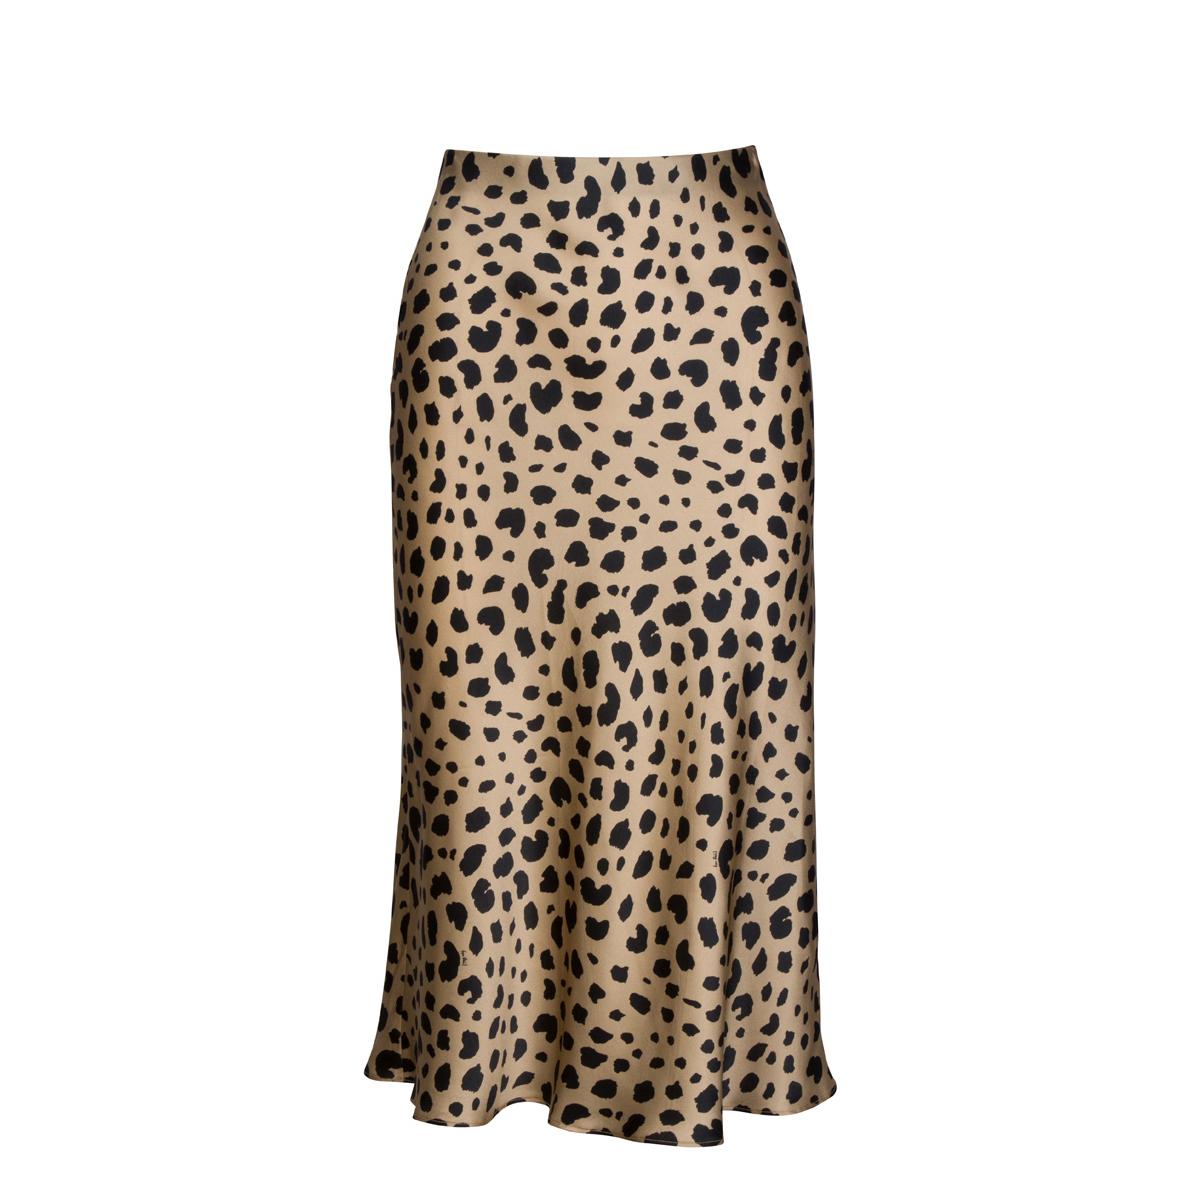 Realisation par naomi wild things leopard print skirt 1